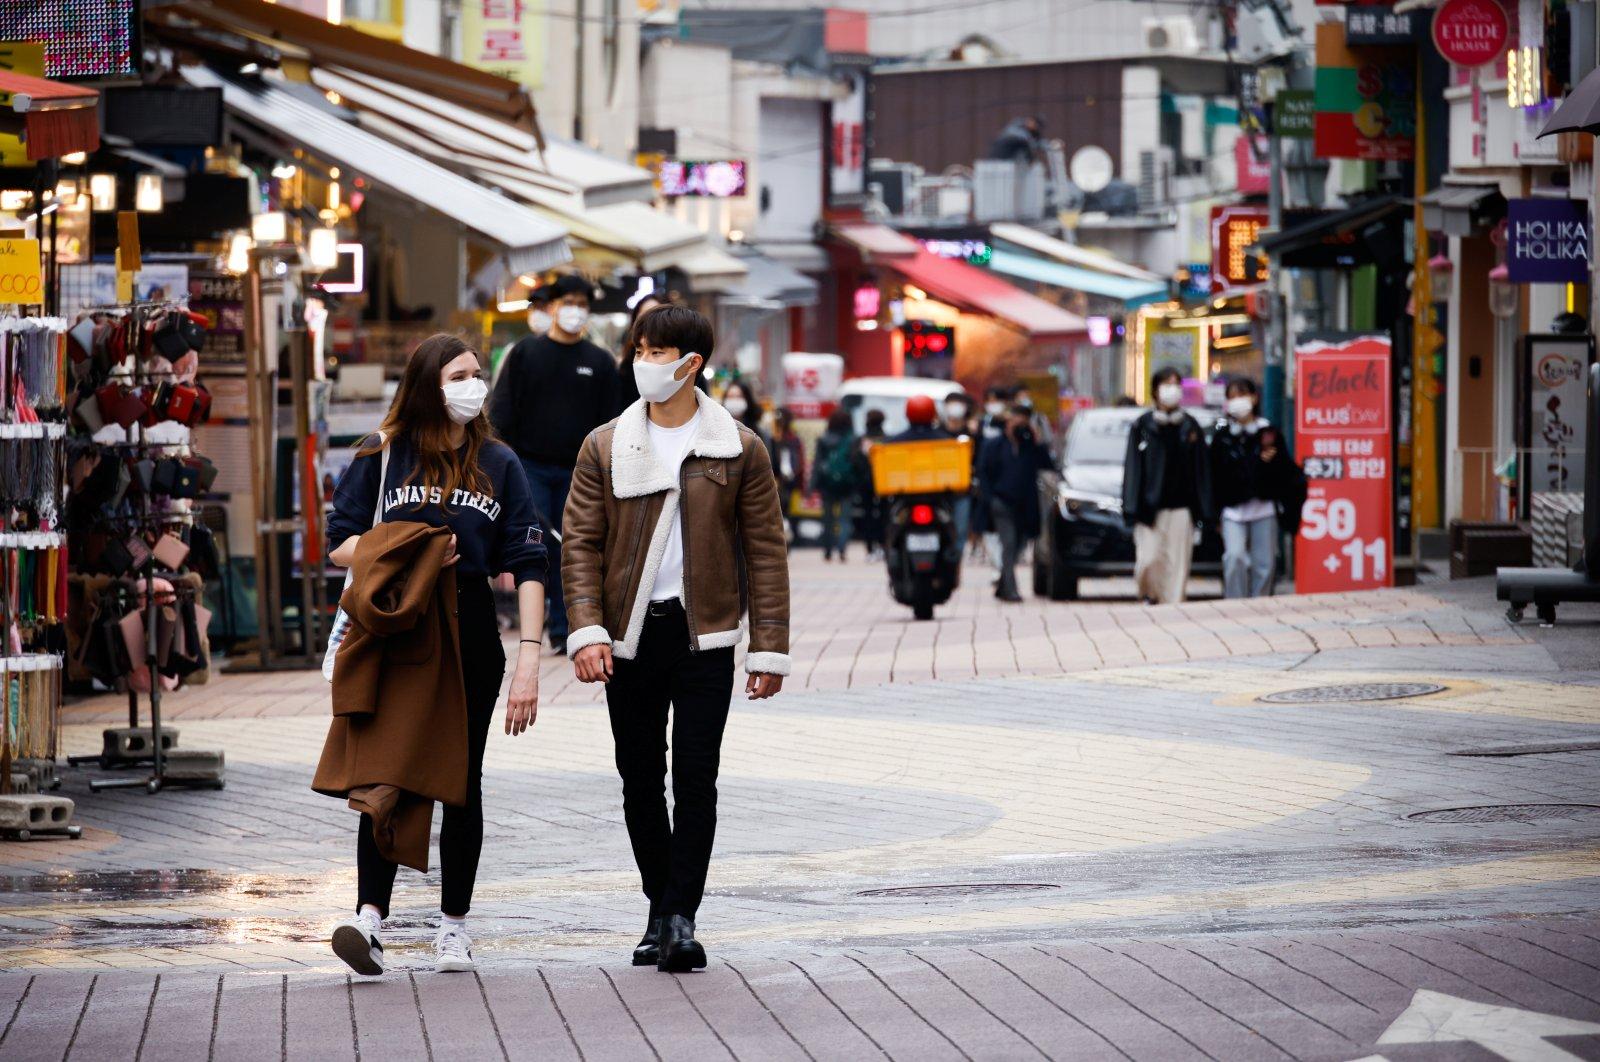 Pedestrians walk on a shopping street in Seoul, South Korea, Nov. 18, 2020. (Reuters Photo)